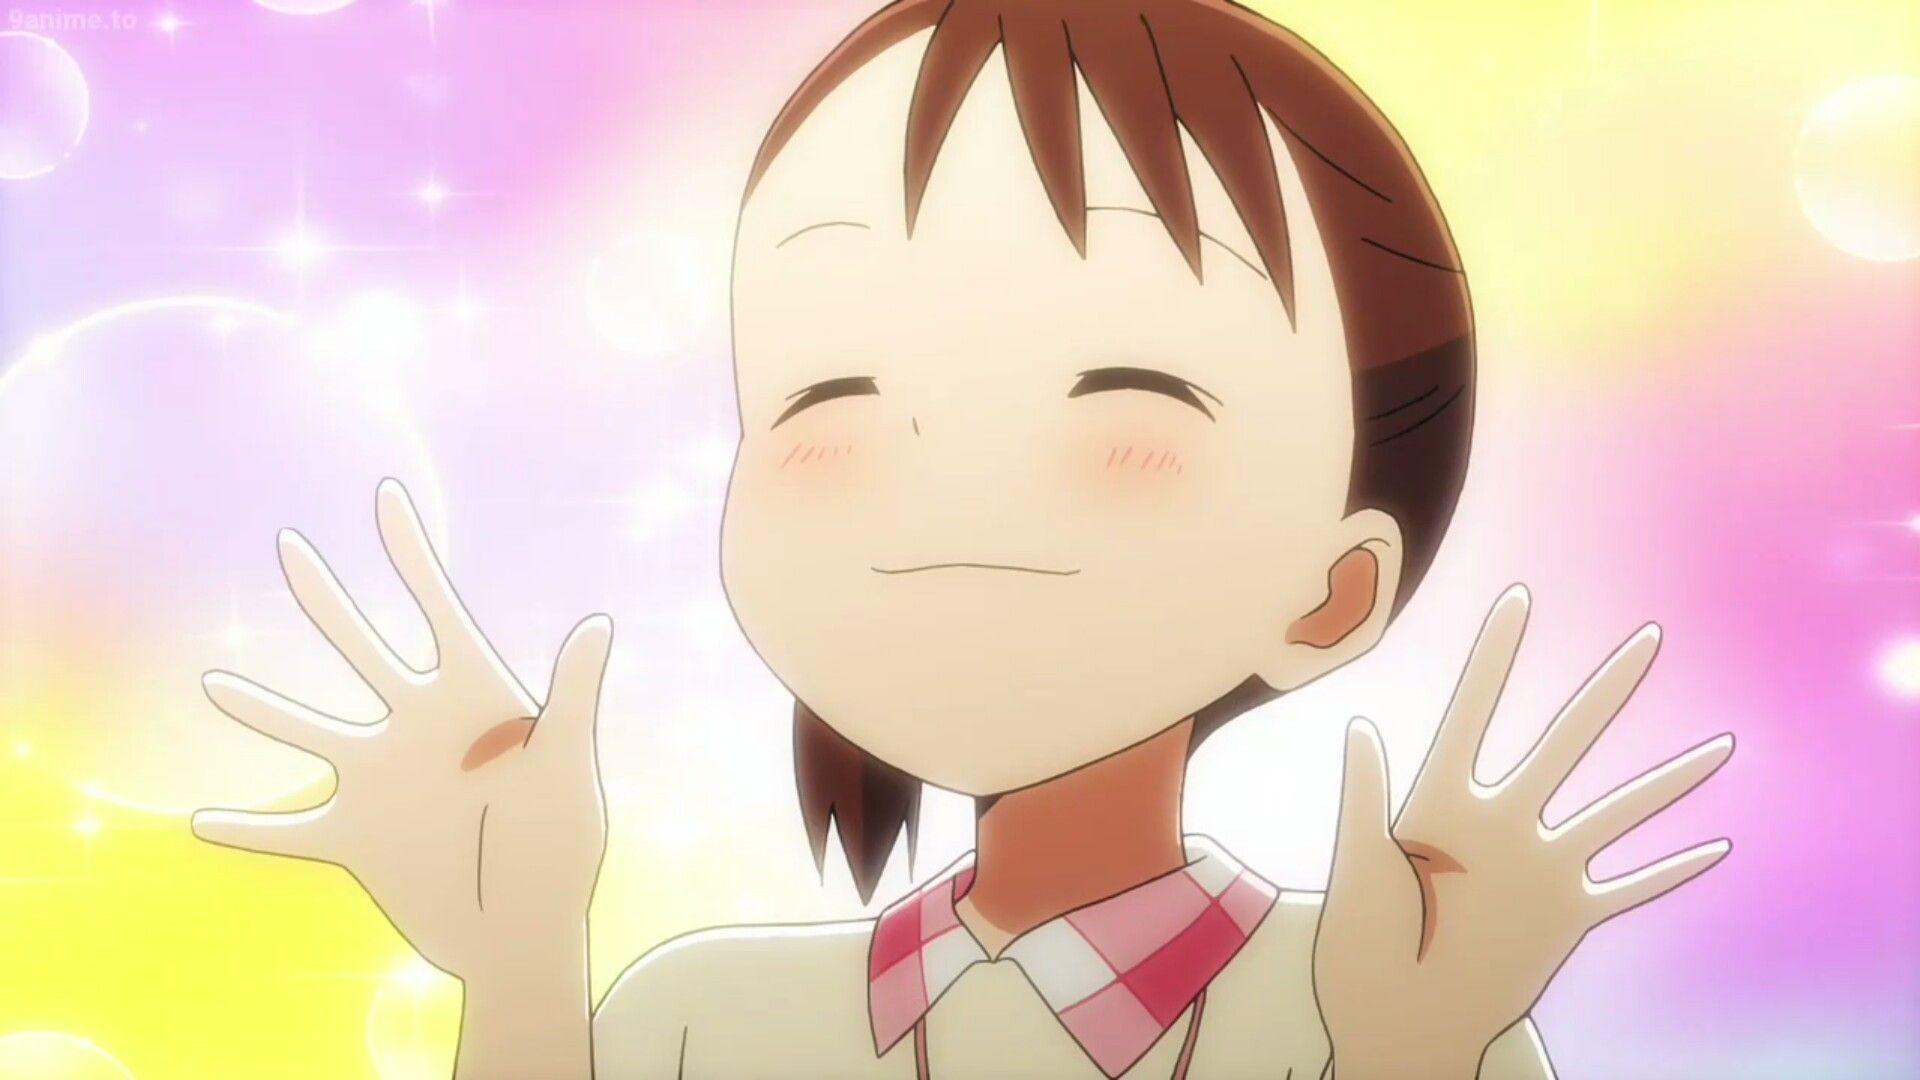 I shine again! Drawings, Anime, Color